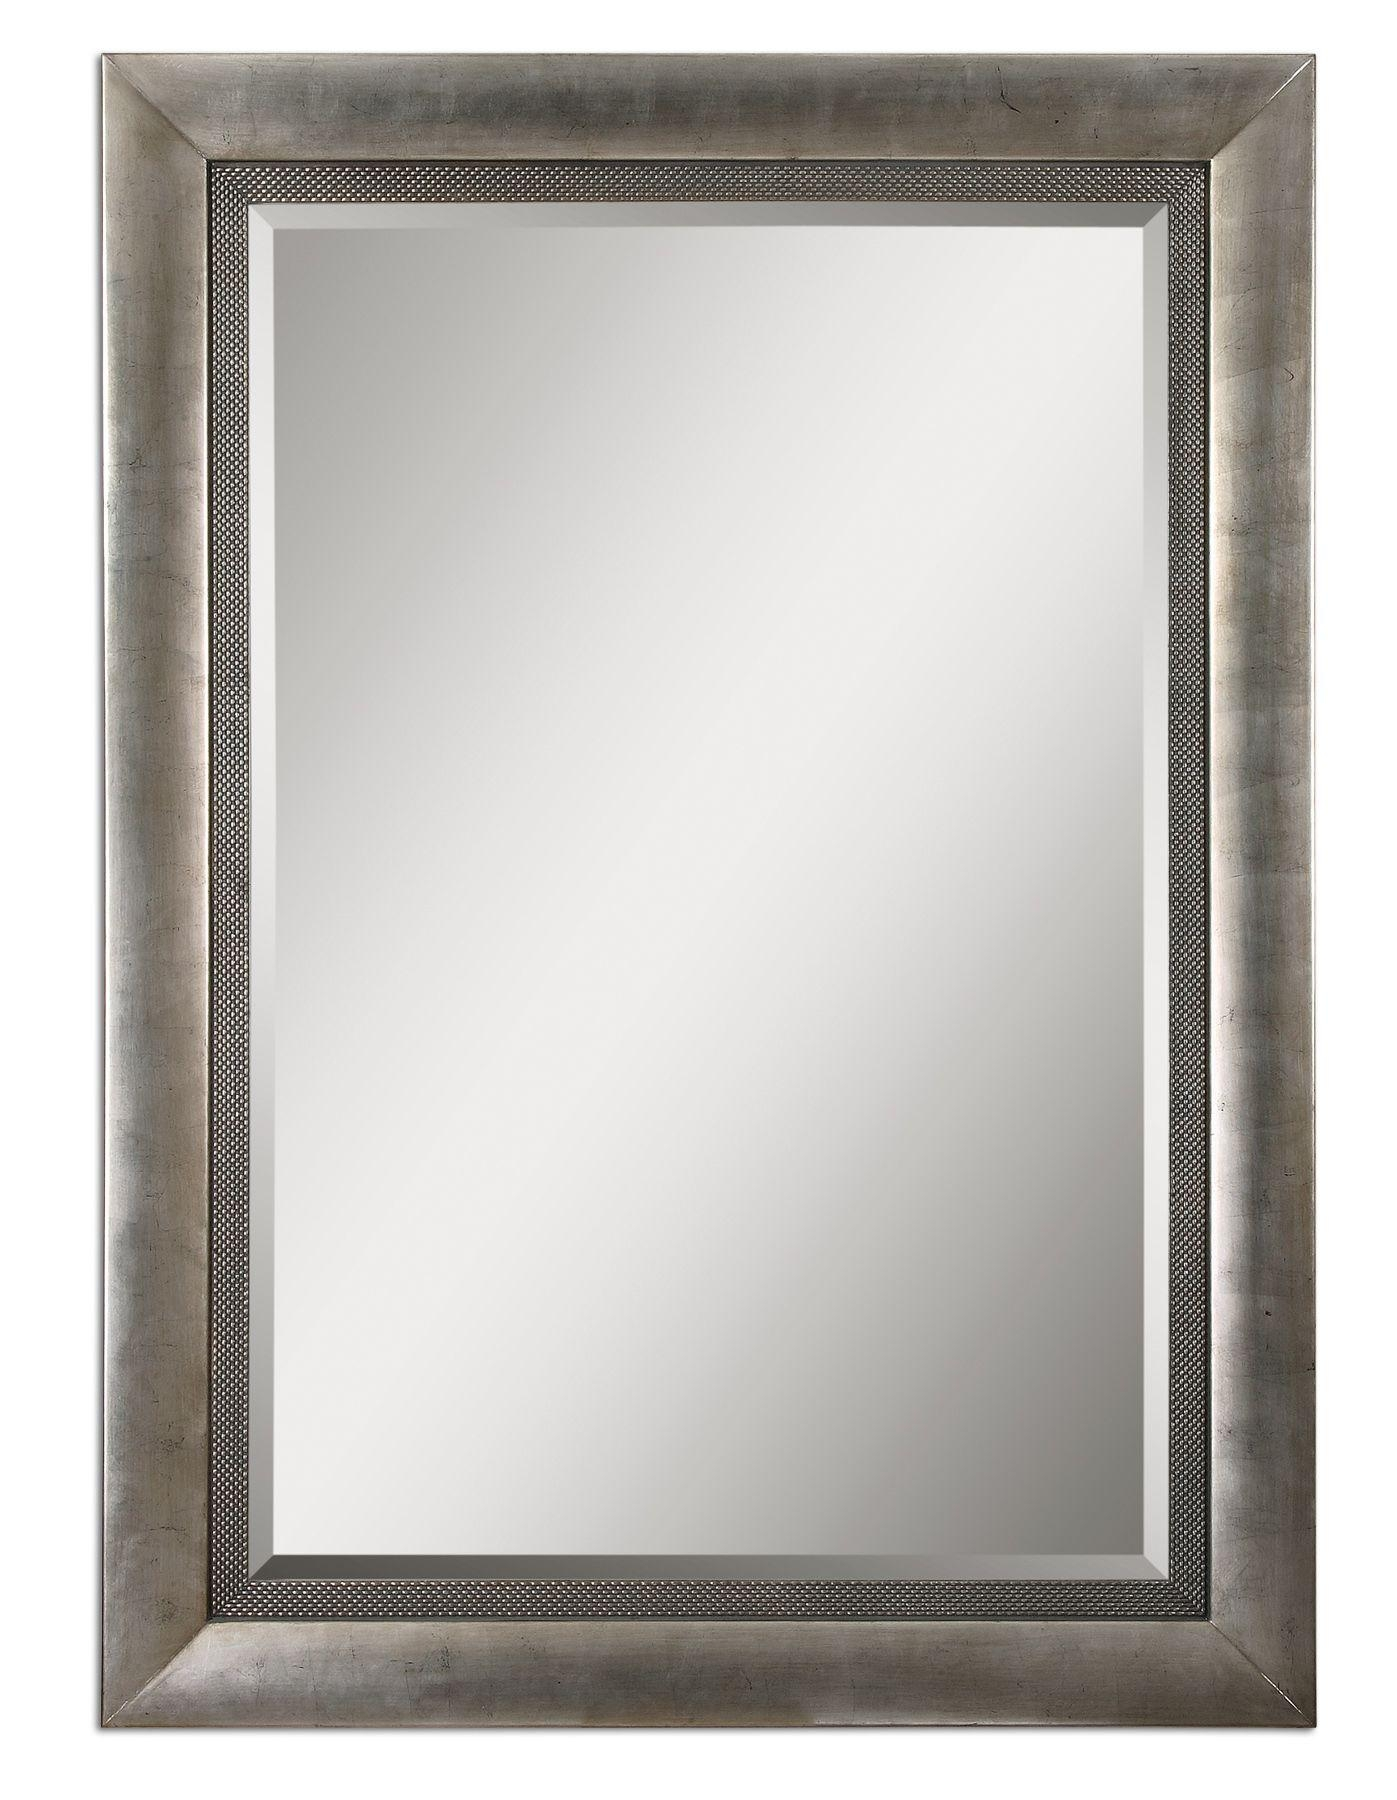 Uttermost Gilford Antique Silver Mirror 14207 Regarding Vintage Silver Mirror (Photo 7 of 20)